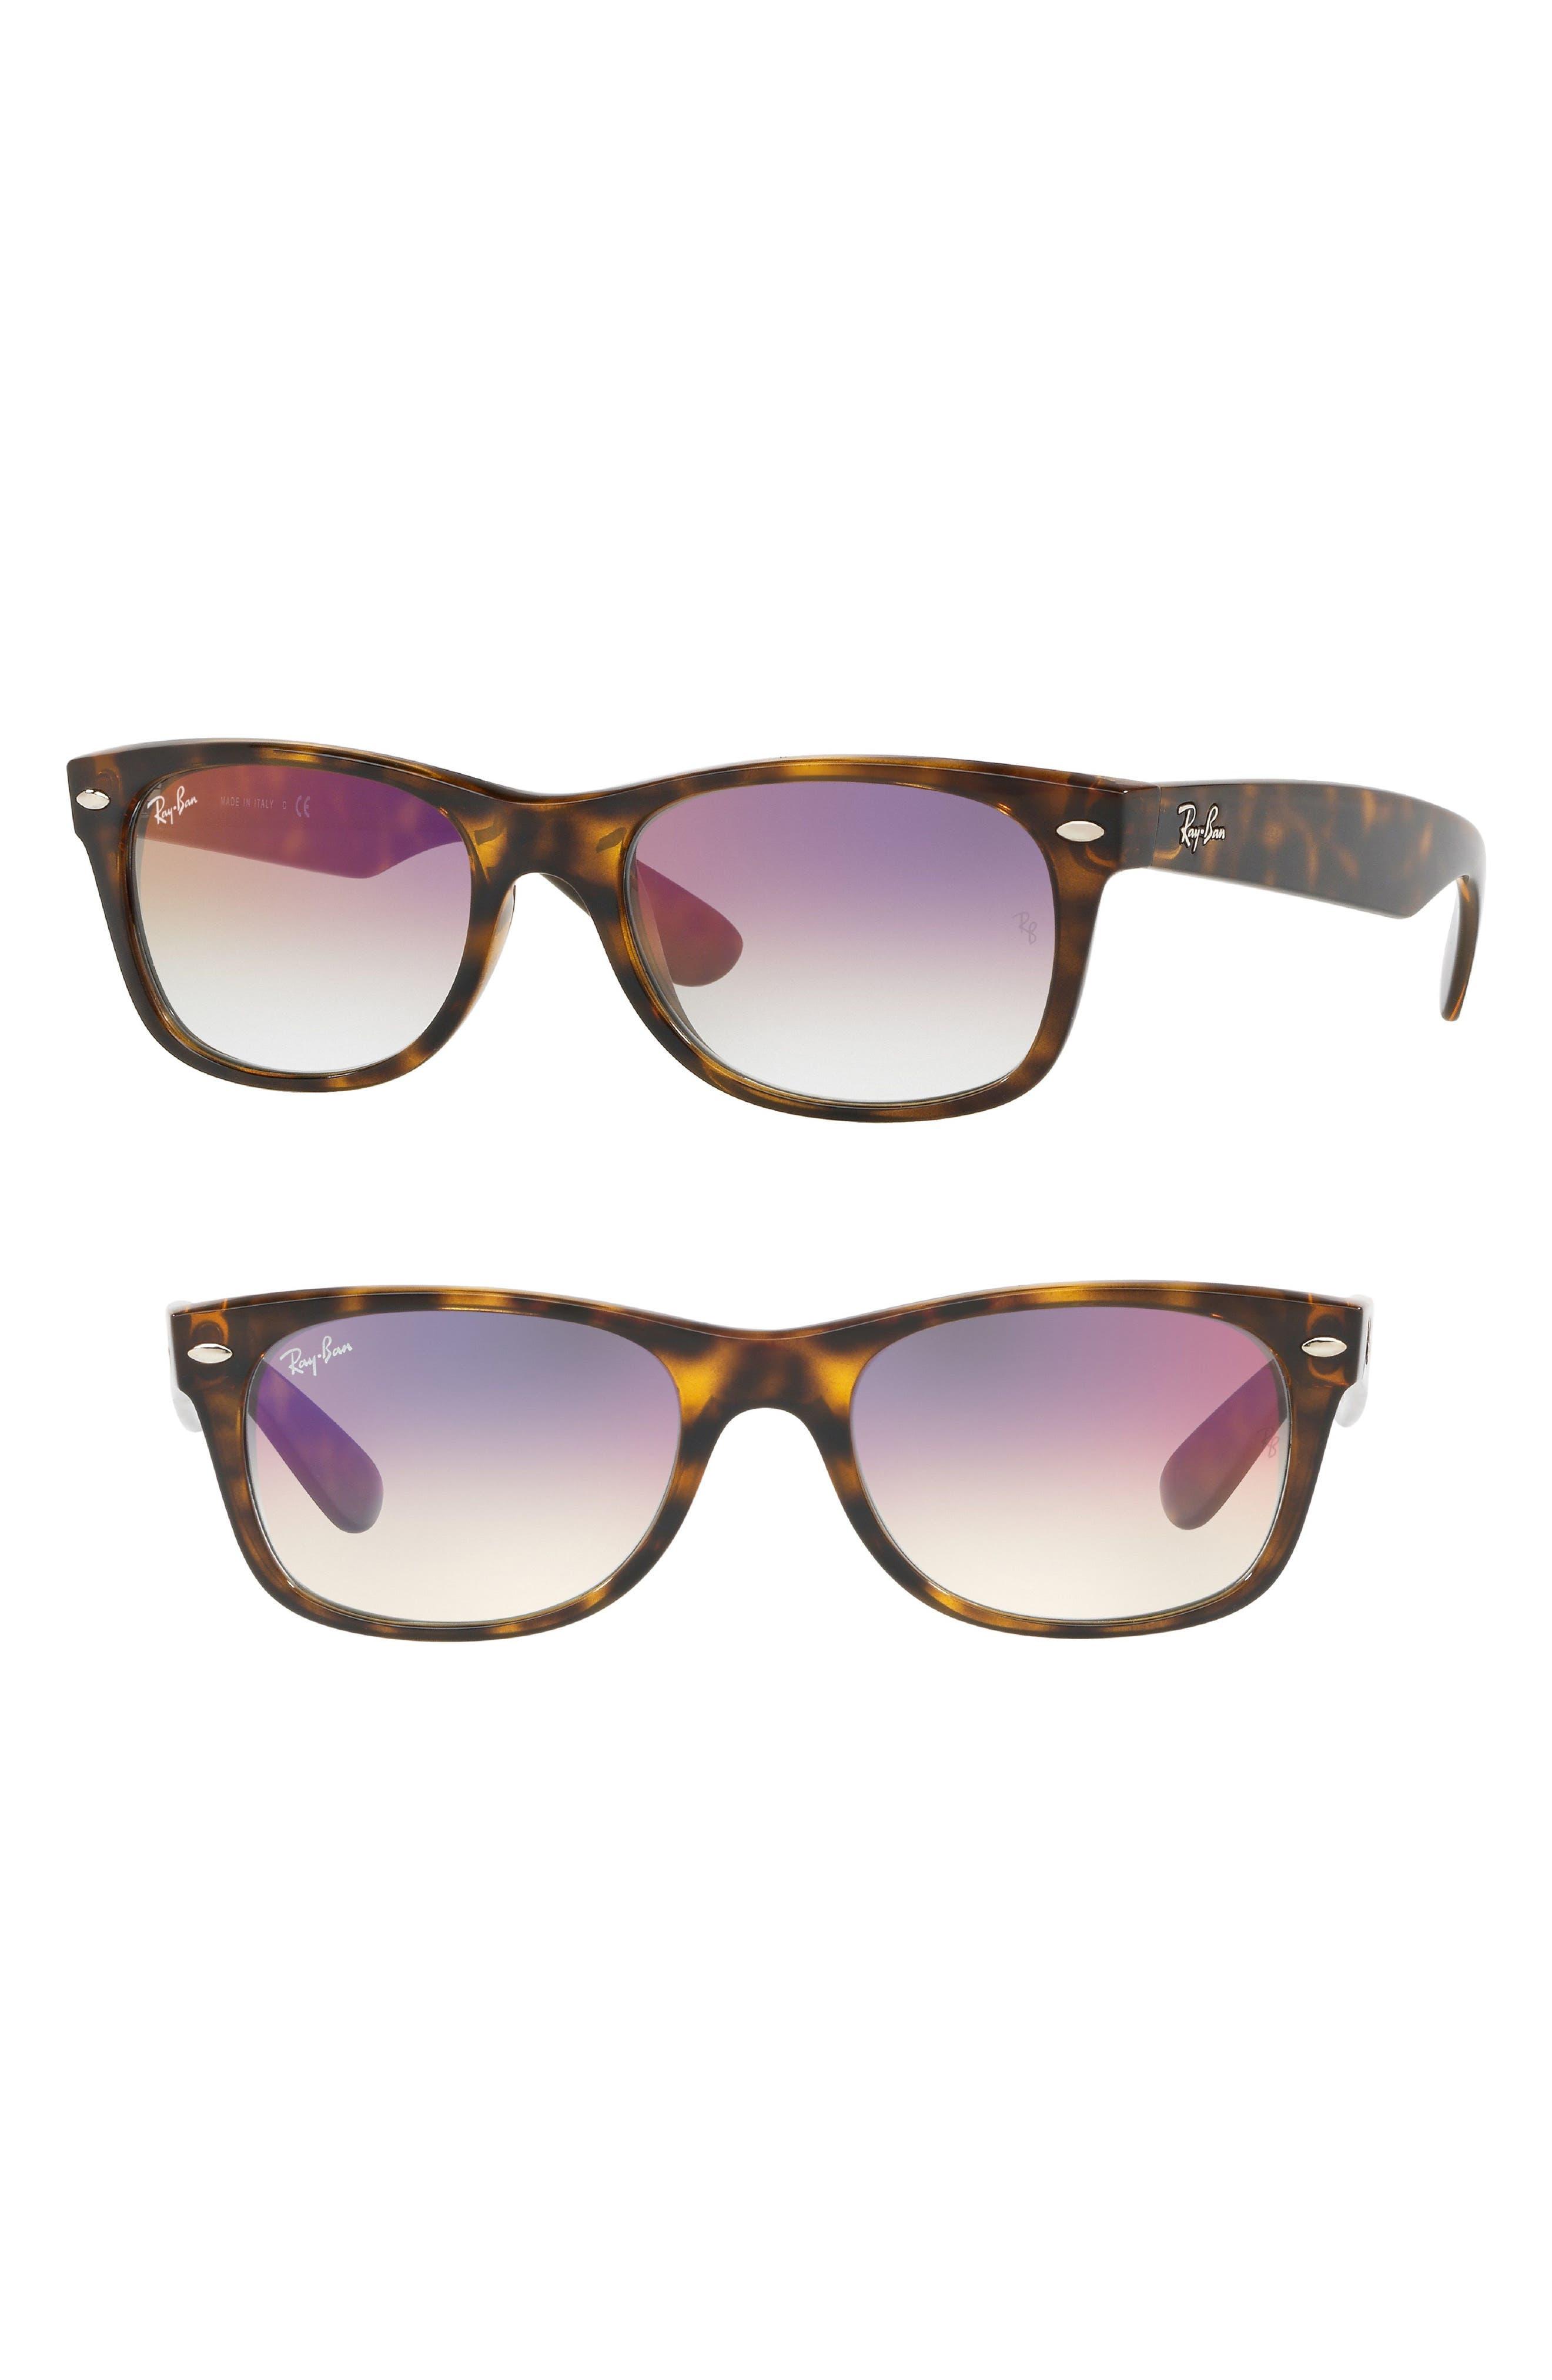 Ray-Ban Standard New Wayfarer 55mm Sunglasses